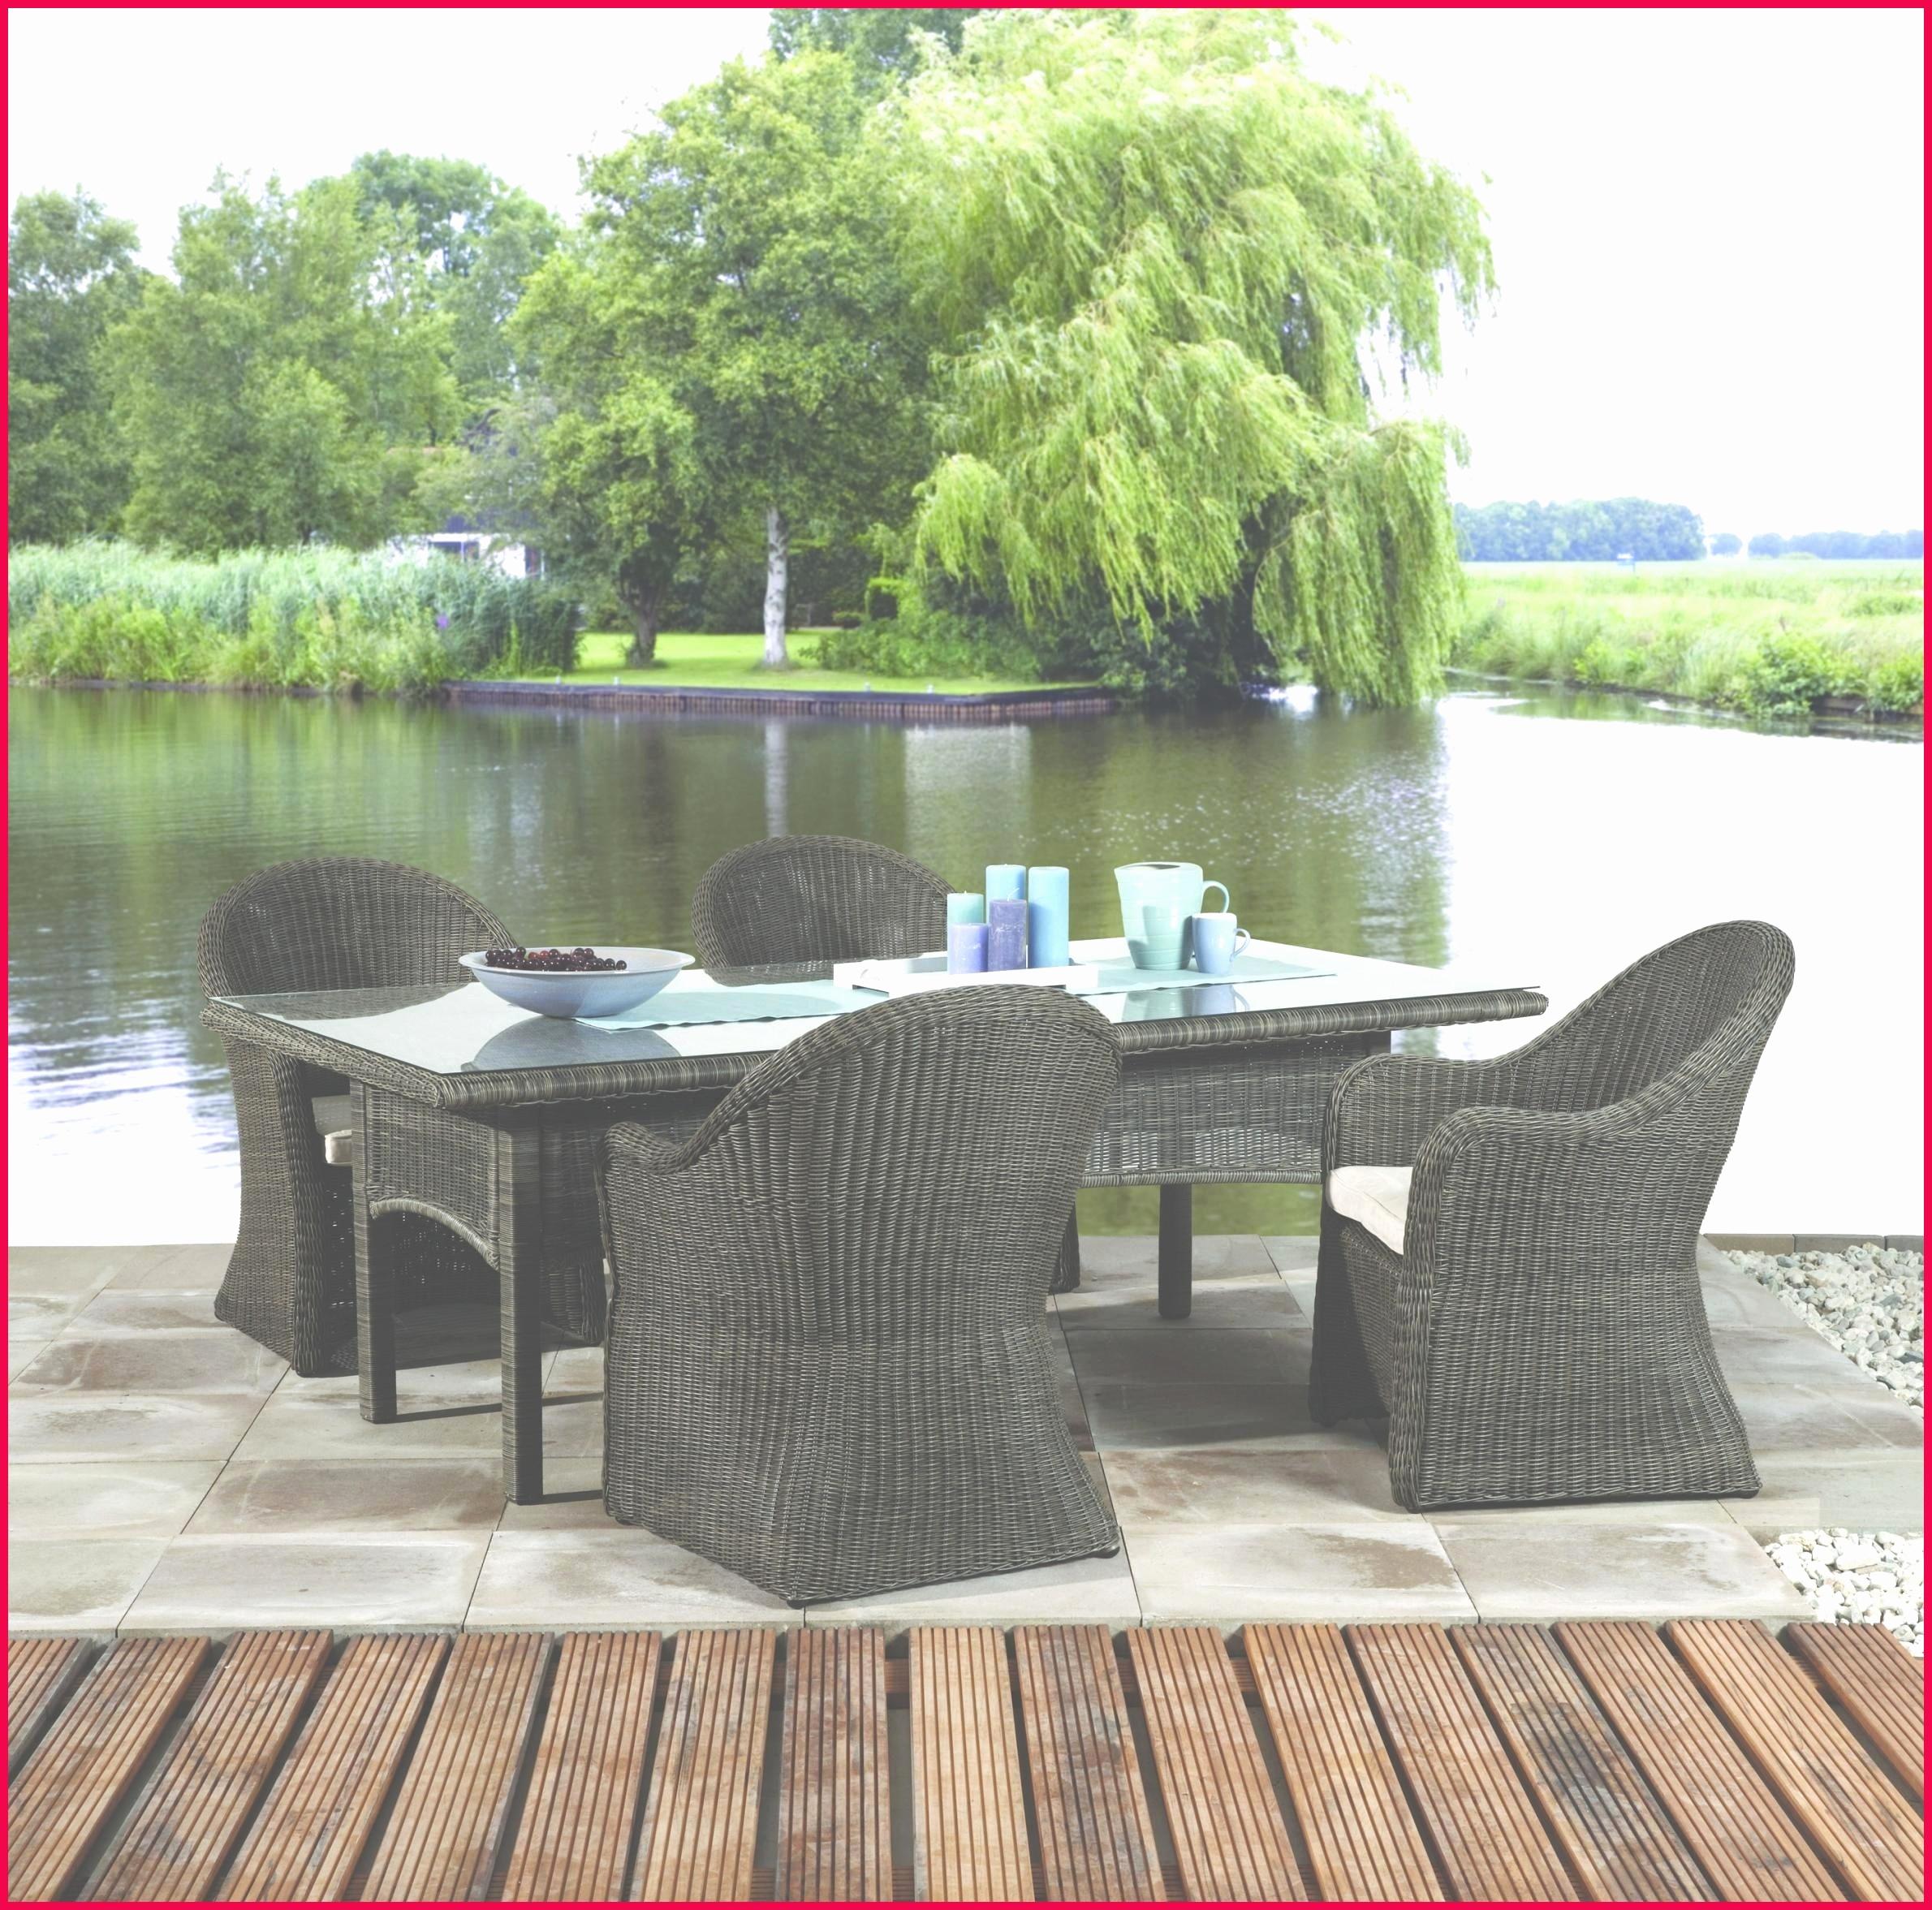 Gifi Chaises De Jardin Luxe Photographie Gifi Mobilier Jardin Meilleur De Gifi Table De Jardin Aussi